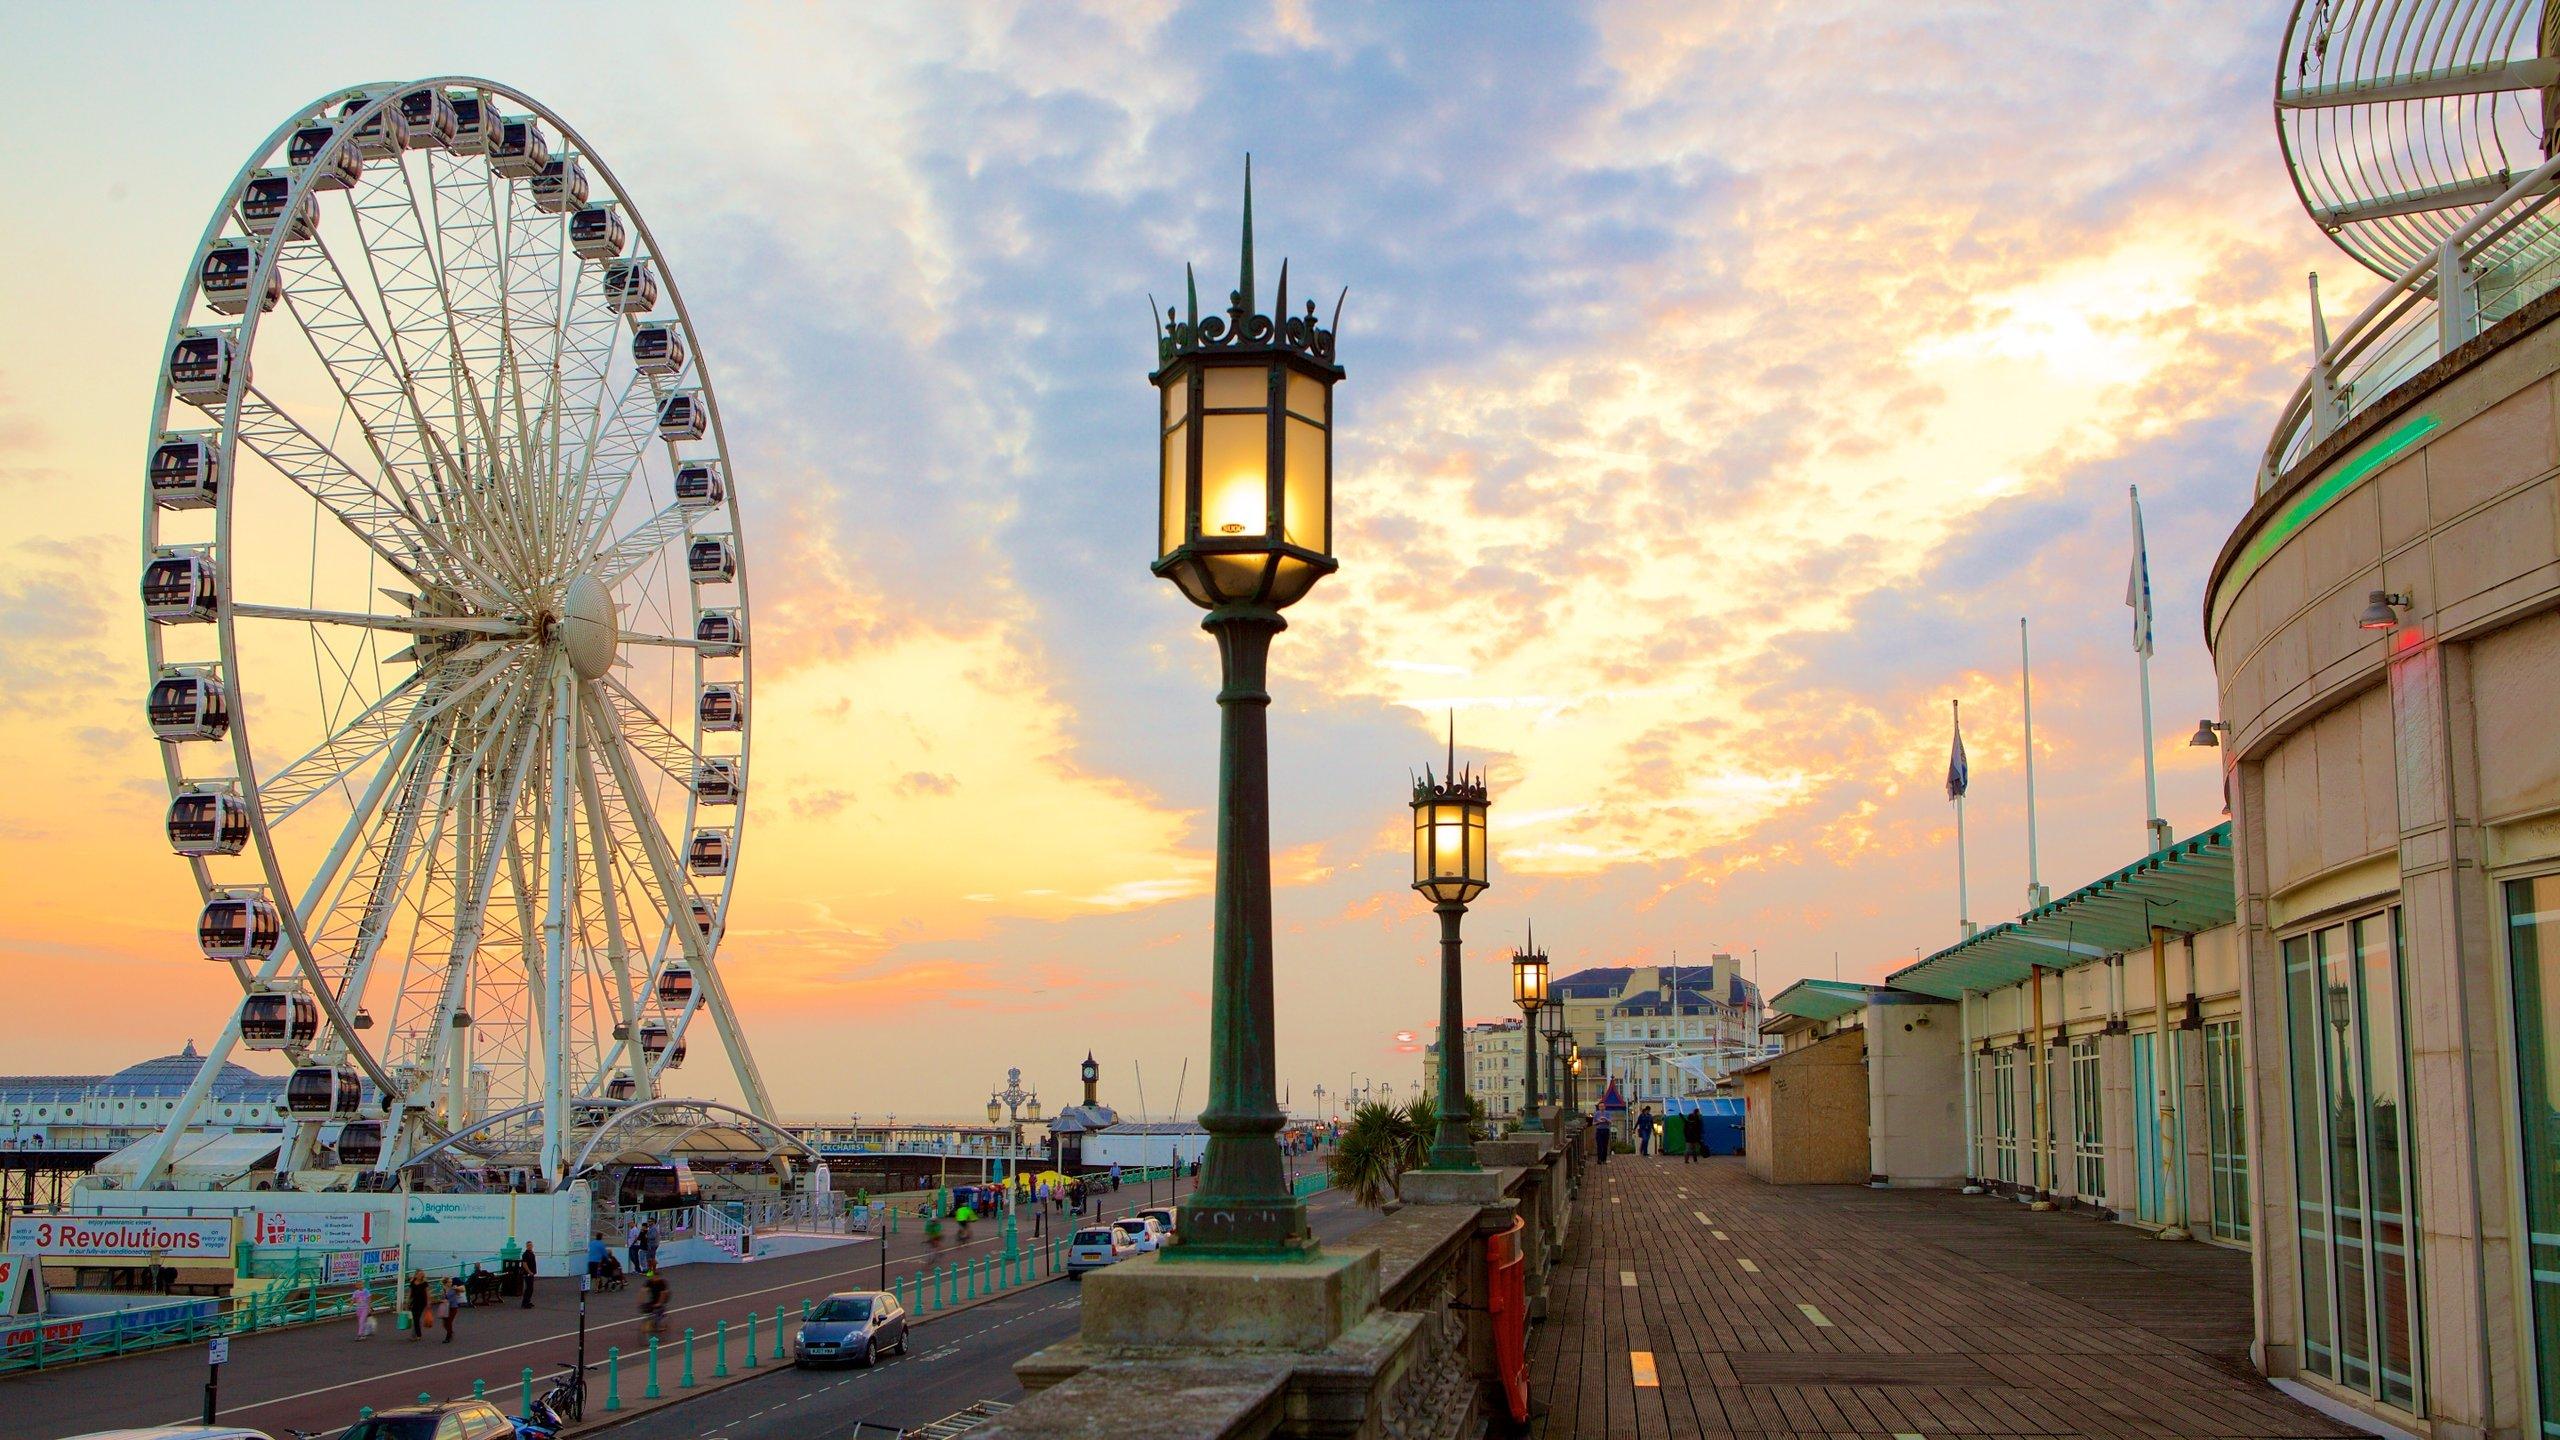 Kemptown, Brighton, England, United Kingdom